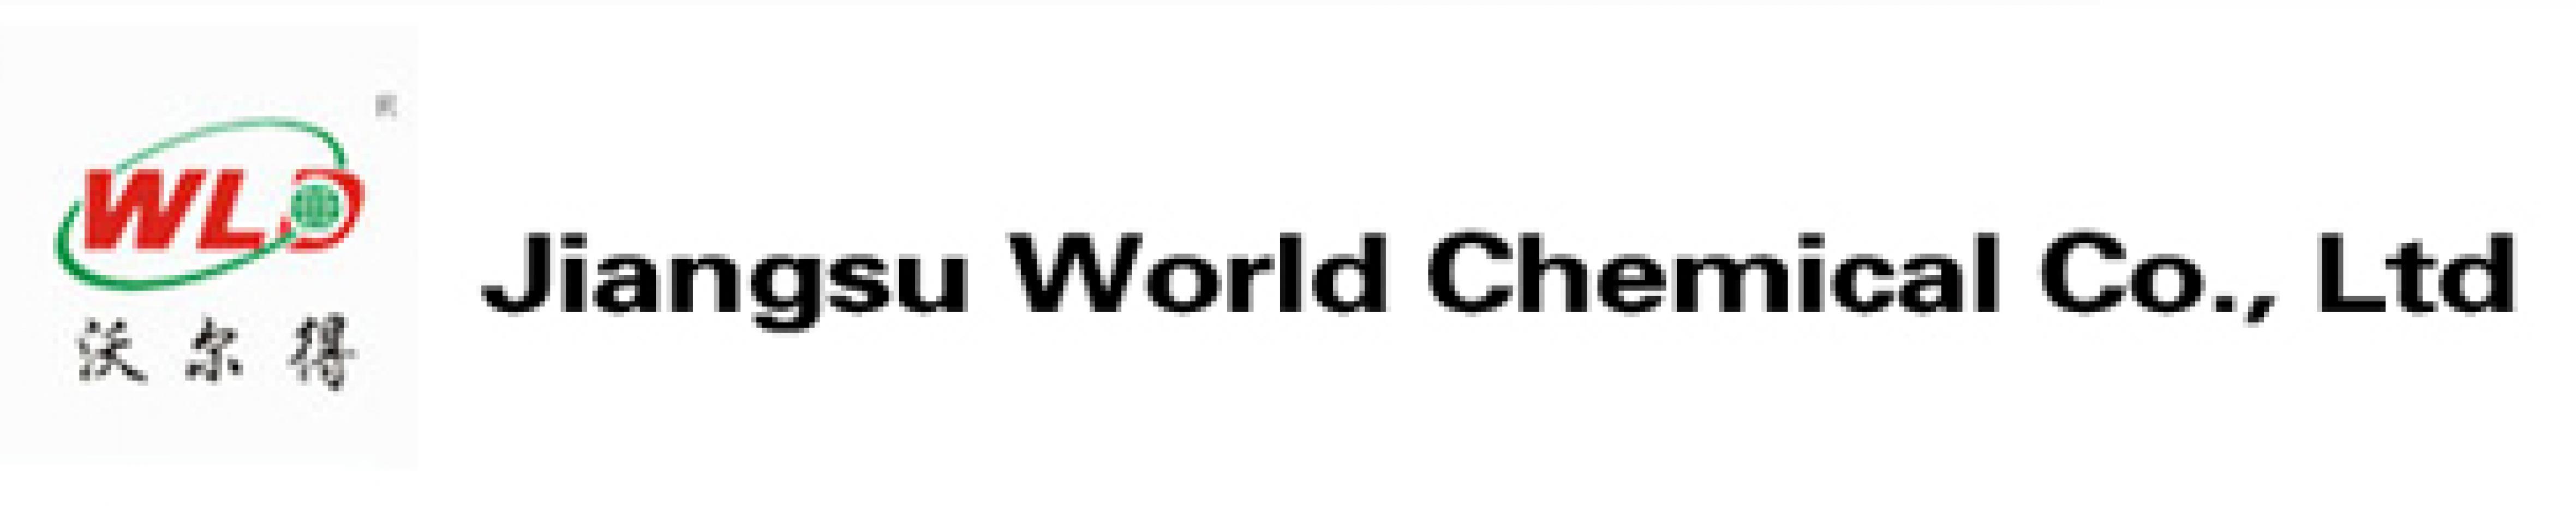 JIANGSU WORLD CHEMICAL CO., LTD.